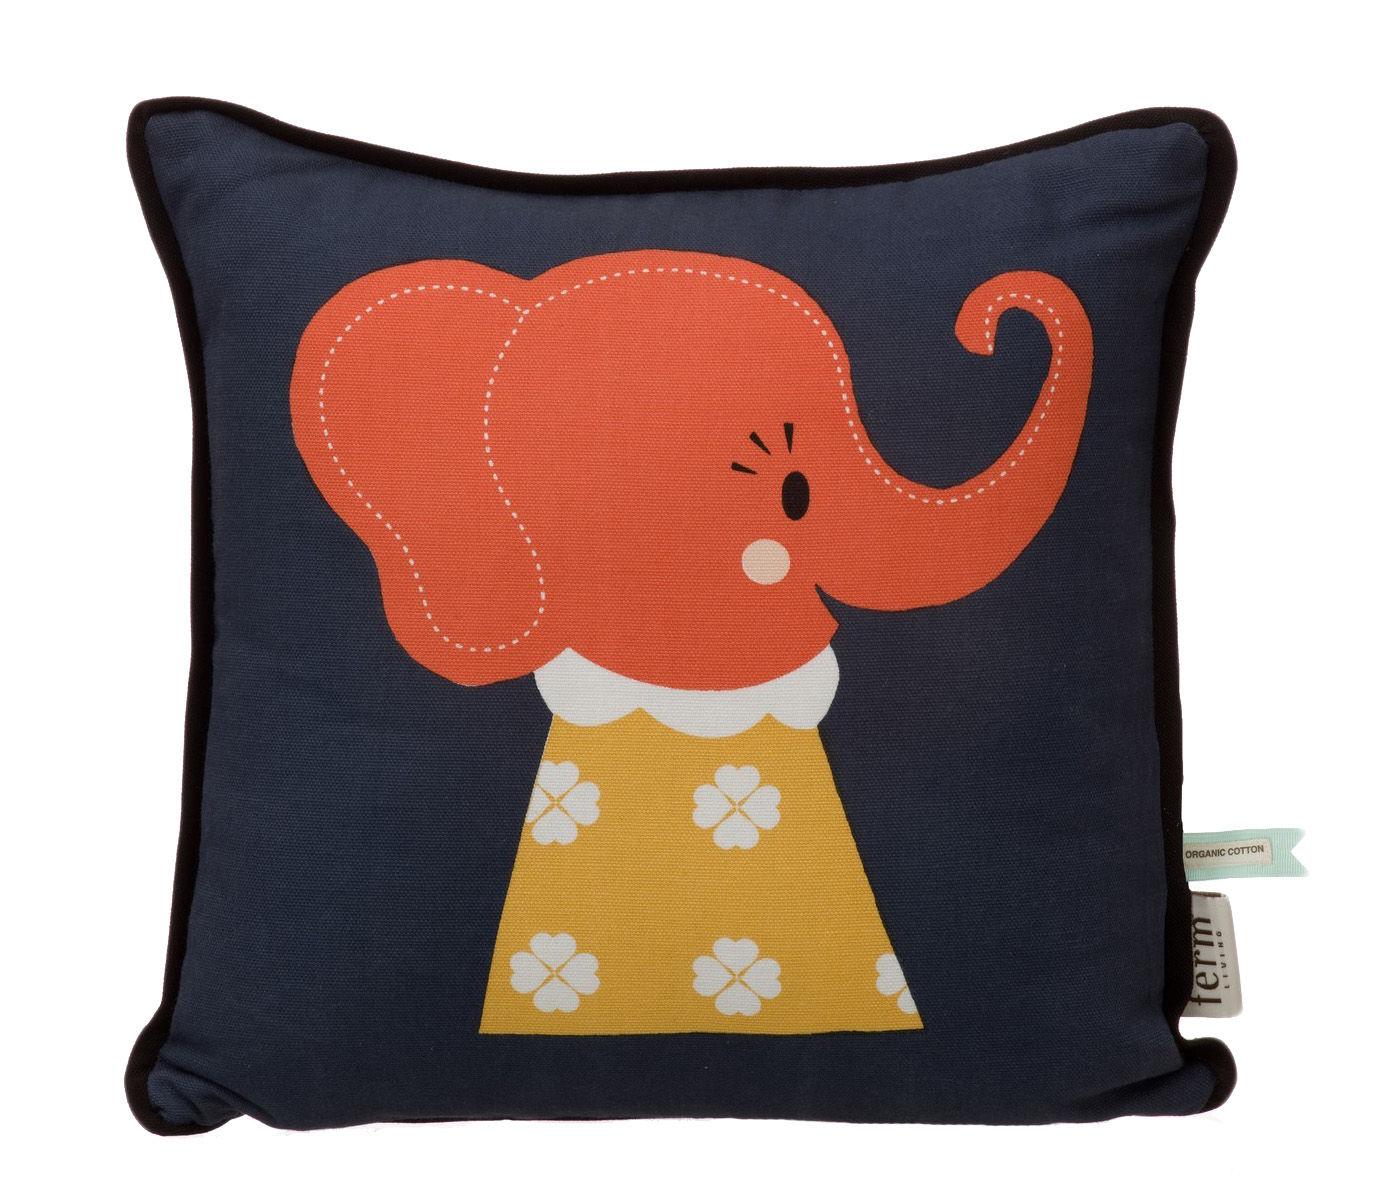 Decoration - Children's Home Accessories - Elle Elephant Cushion by Ferm Living - Orange, red & white / Brown background - Cotton